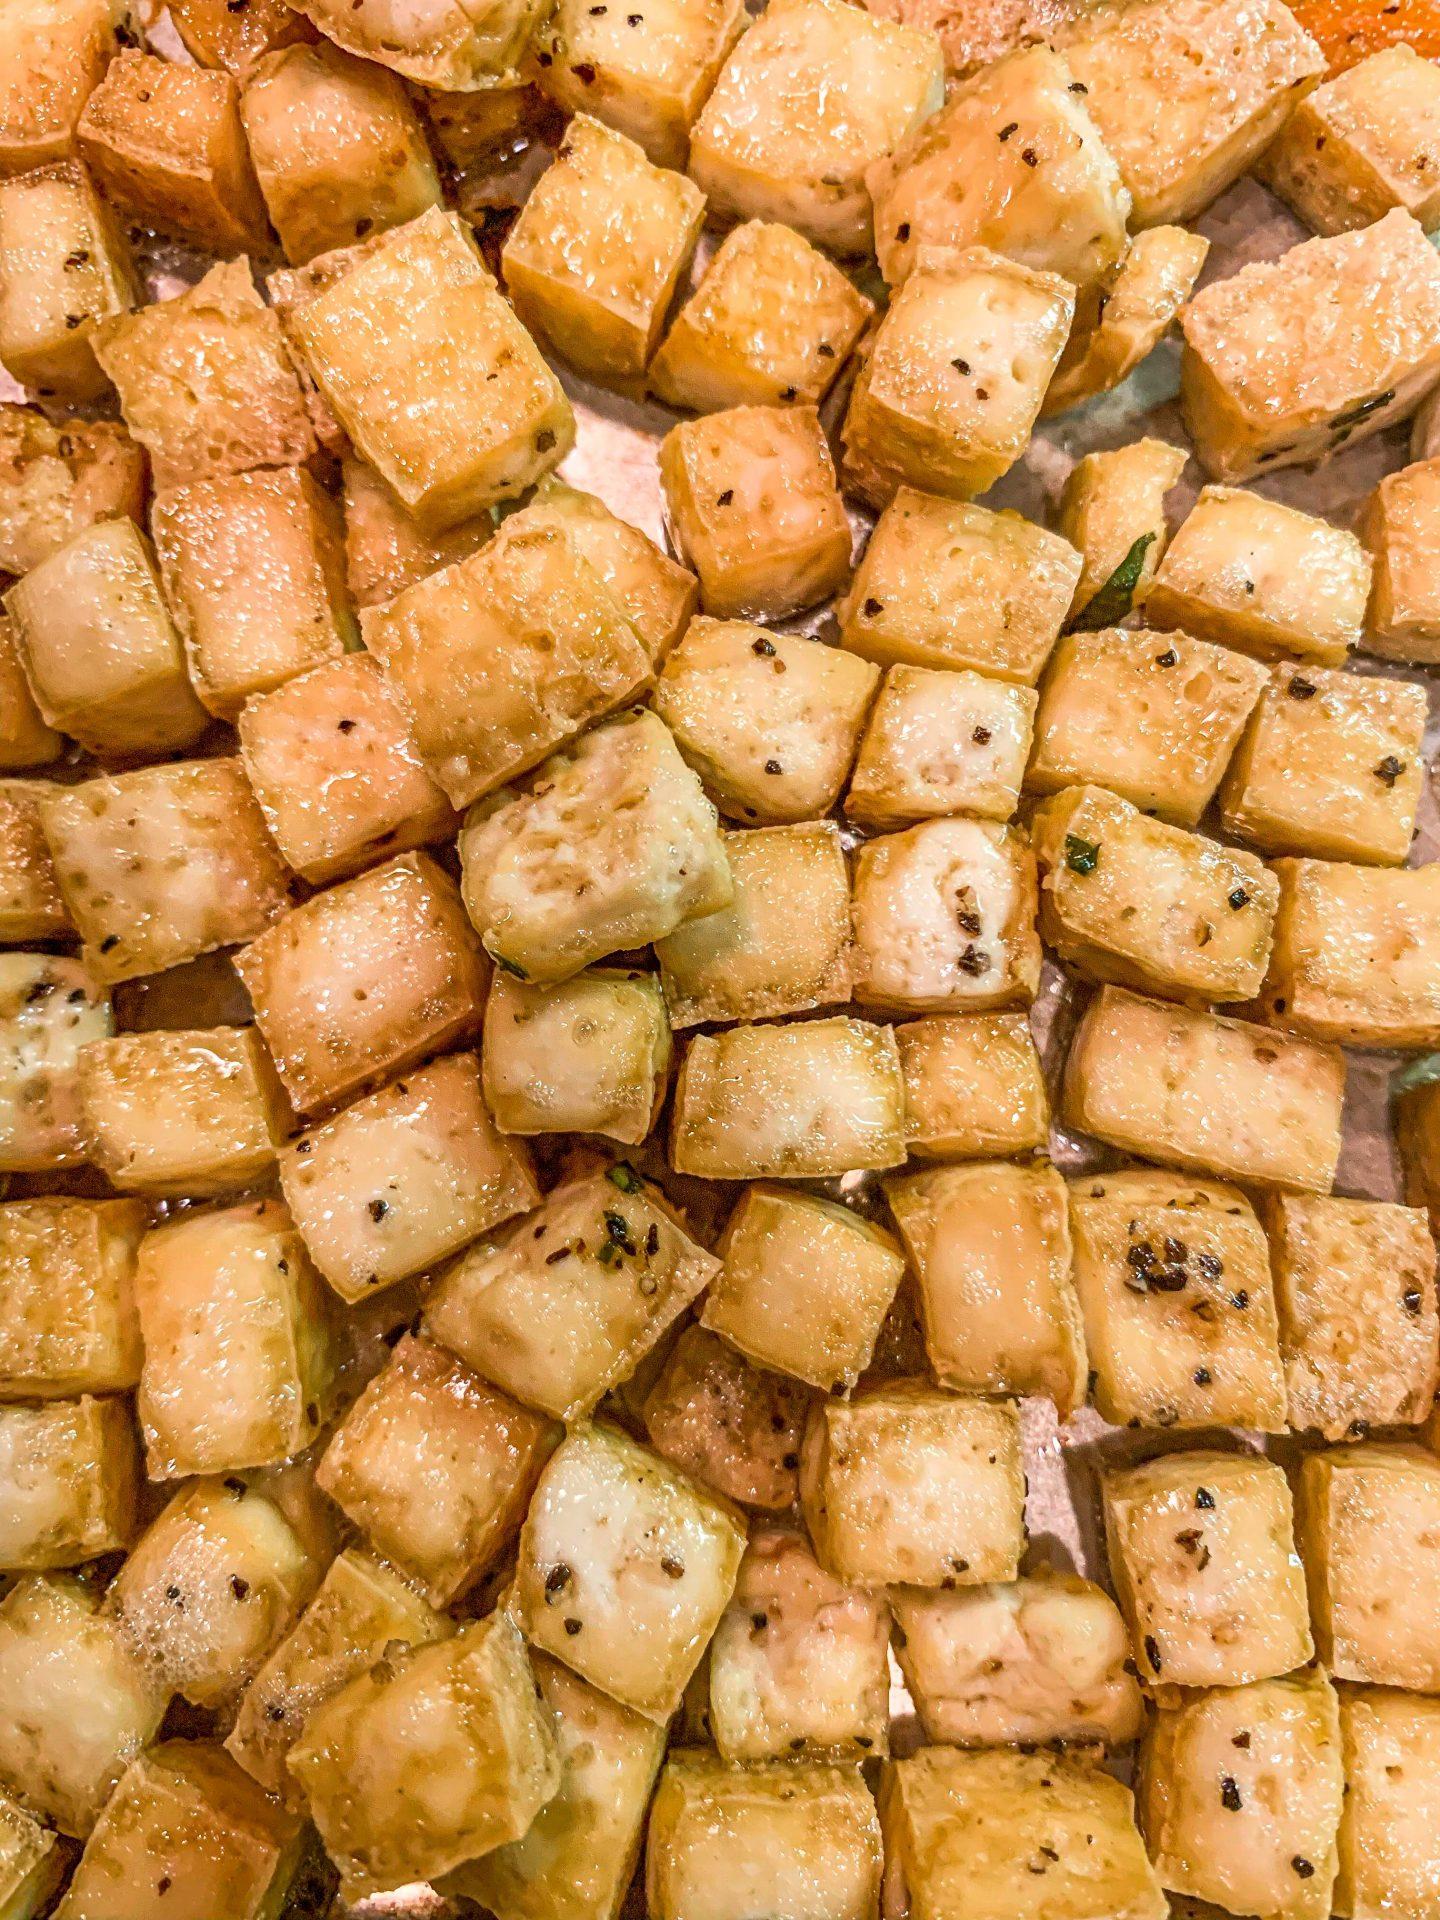 pad thai, vegan, gluten free, tofu, healthy, food to eat, dinner ideas, easy, brown rice, tofu